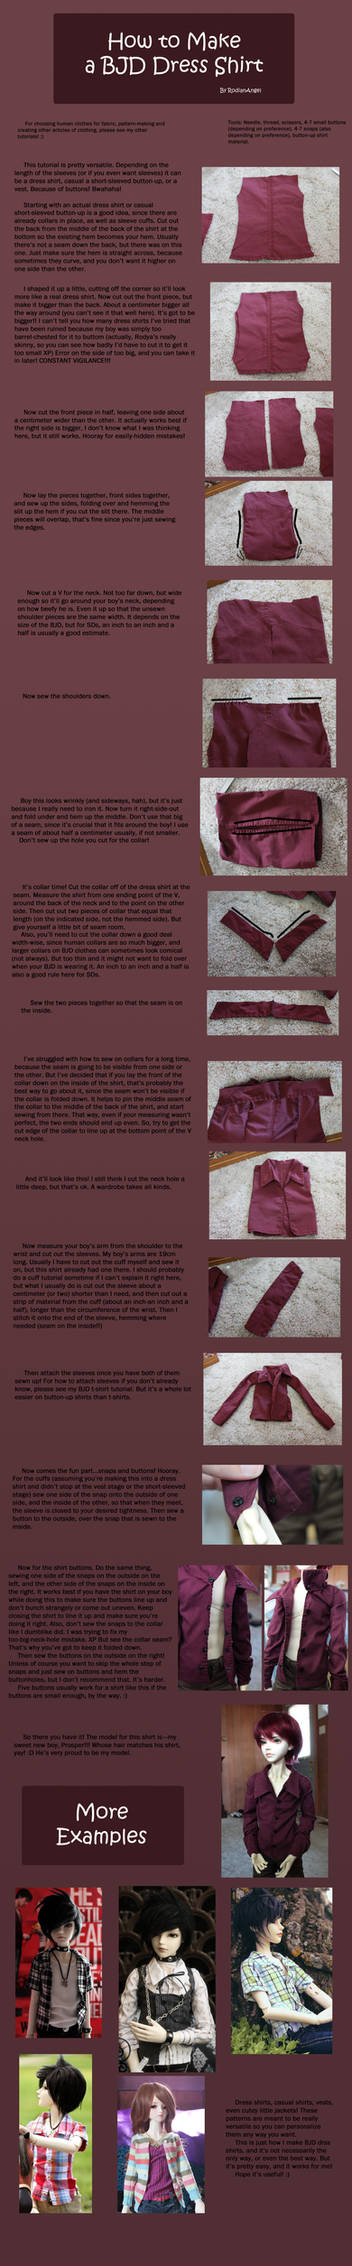 How to Make BJD Dress Shirts